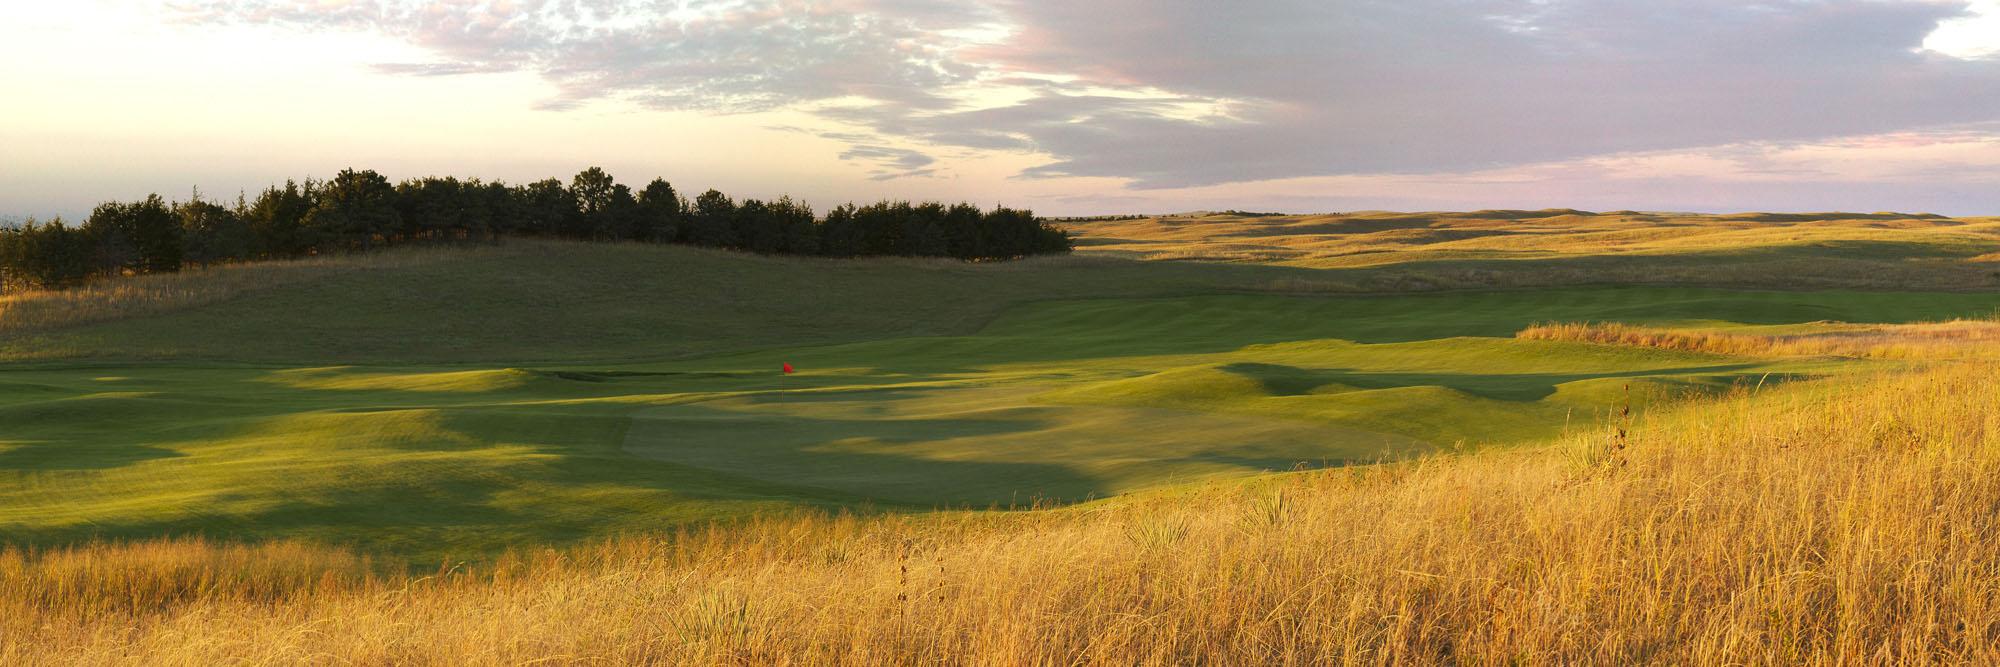 Golf Course Image - The Prairie Club Dunes No. 13